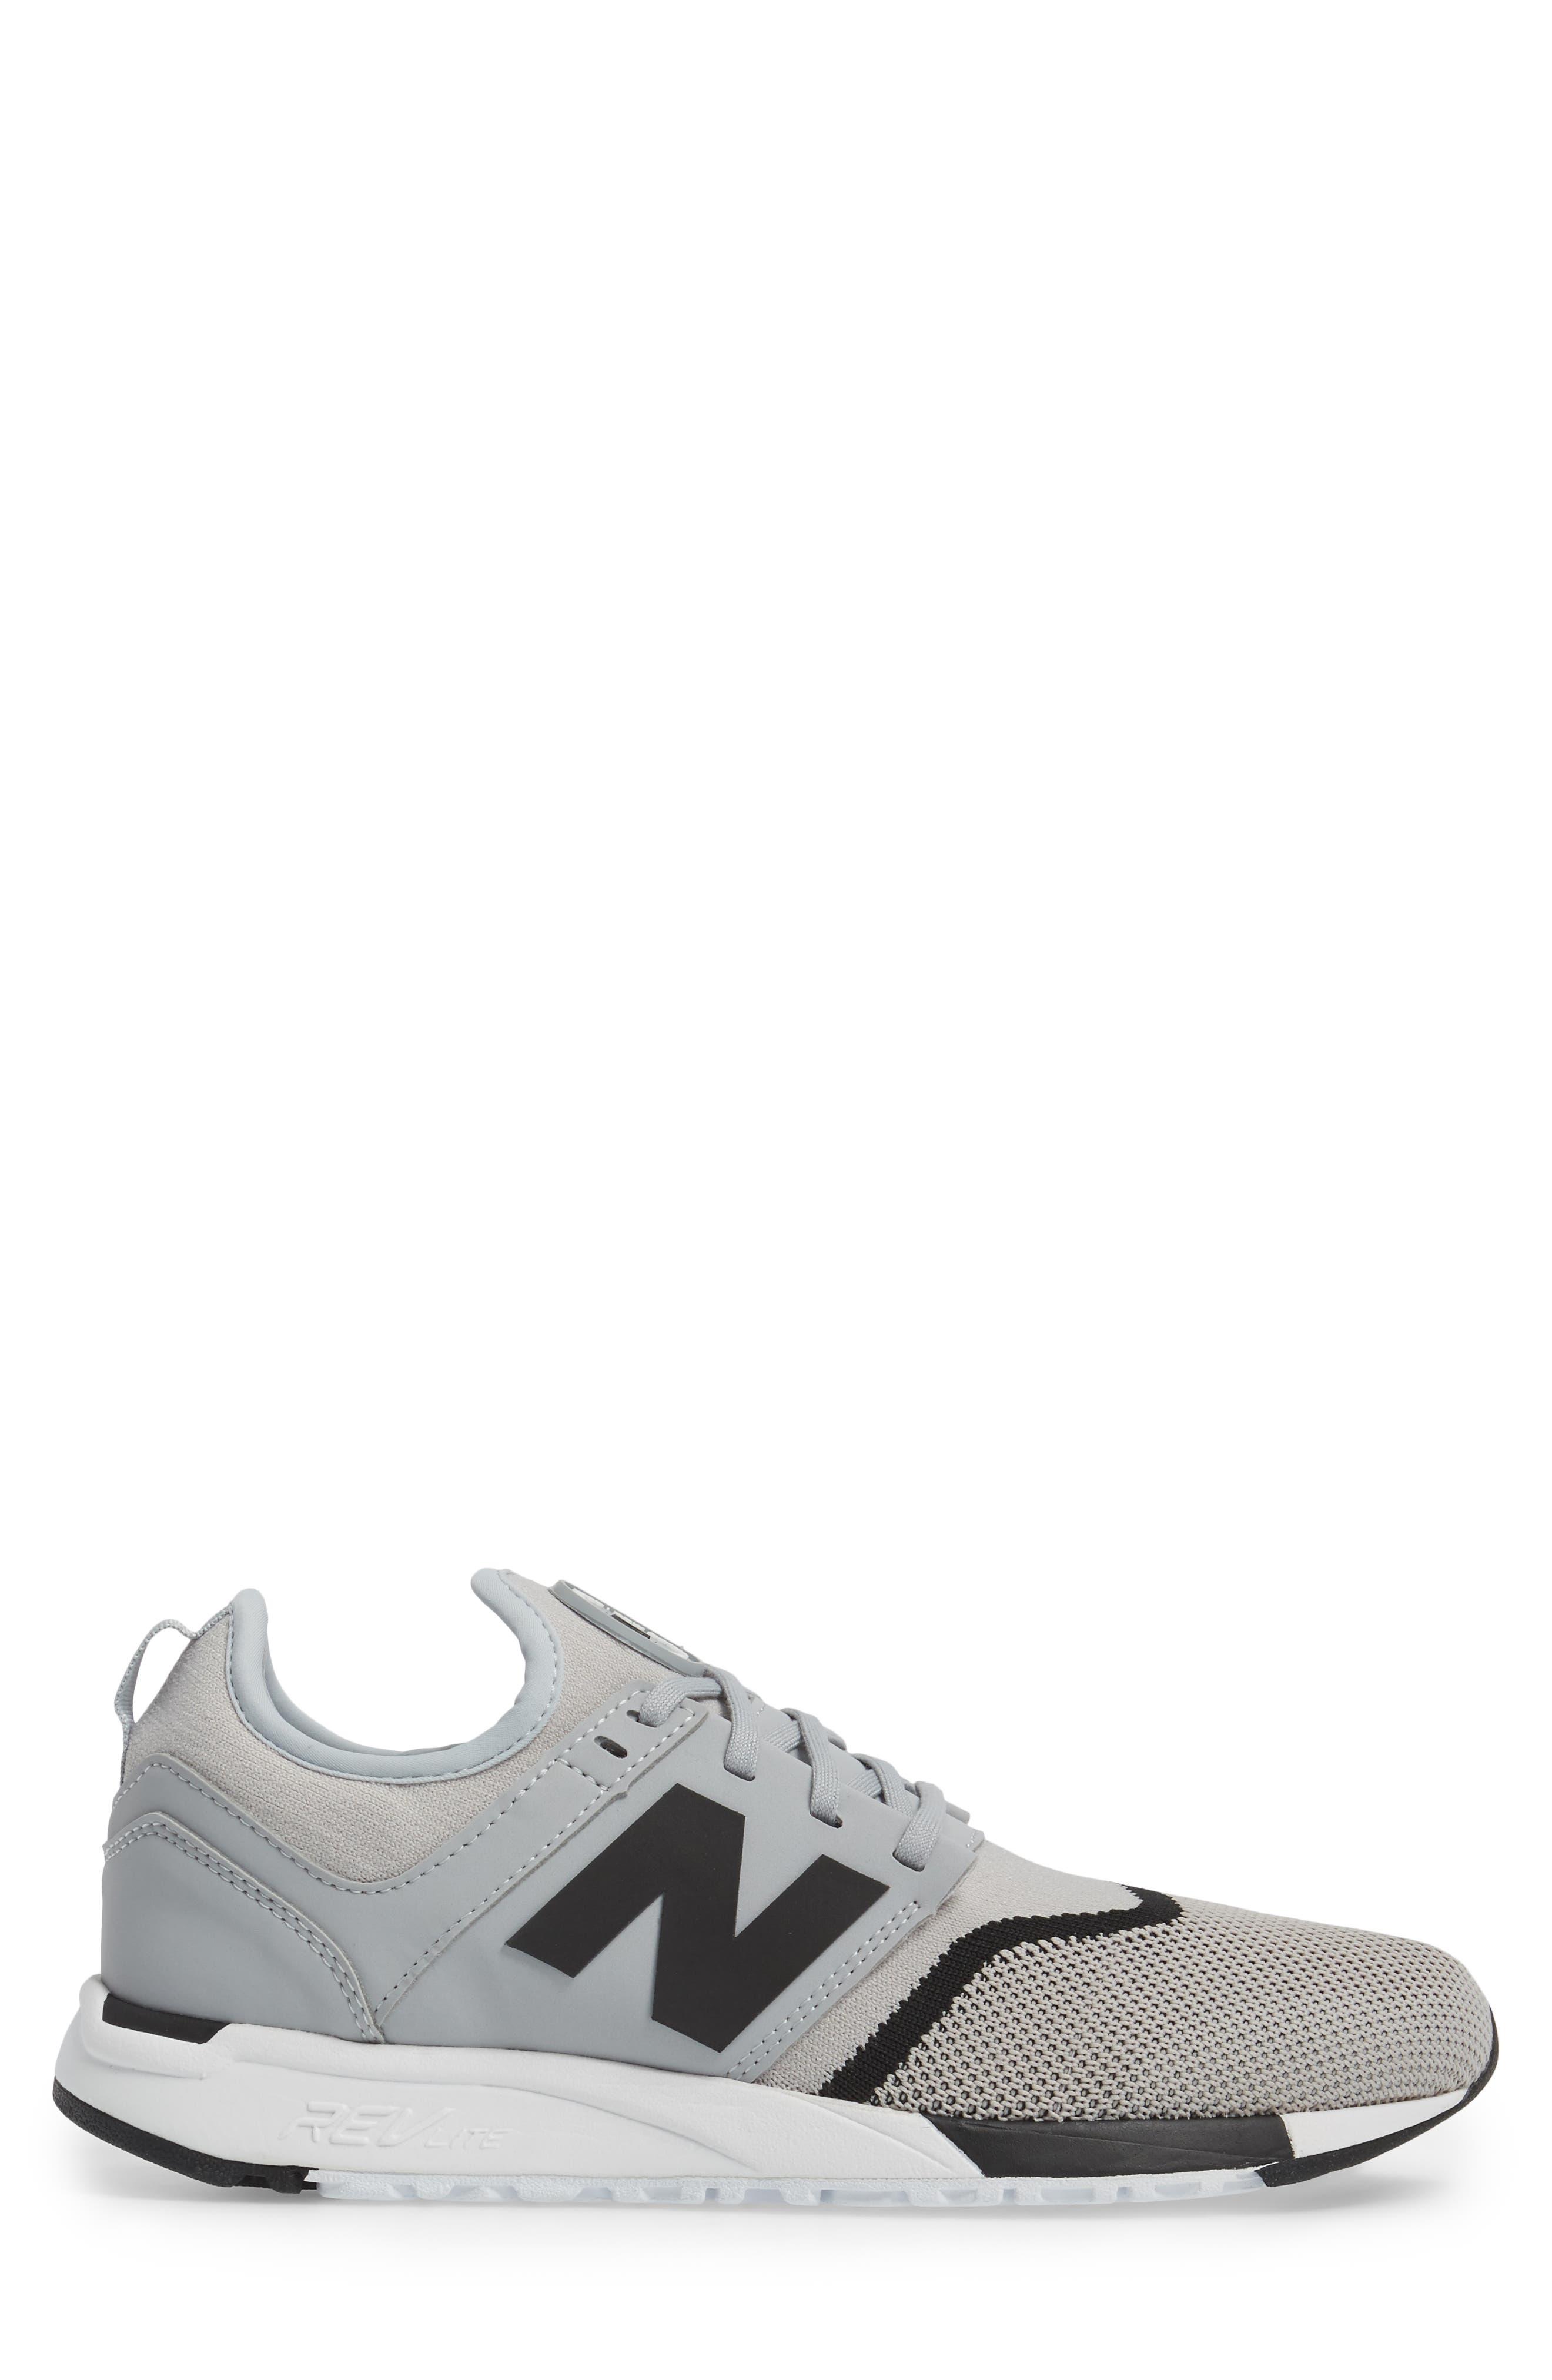 Alternate Image 3  - New Balance 247 Sport Knit Sneaker (Men)